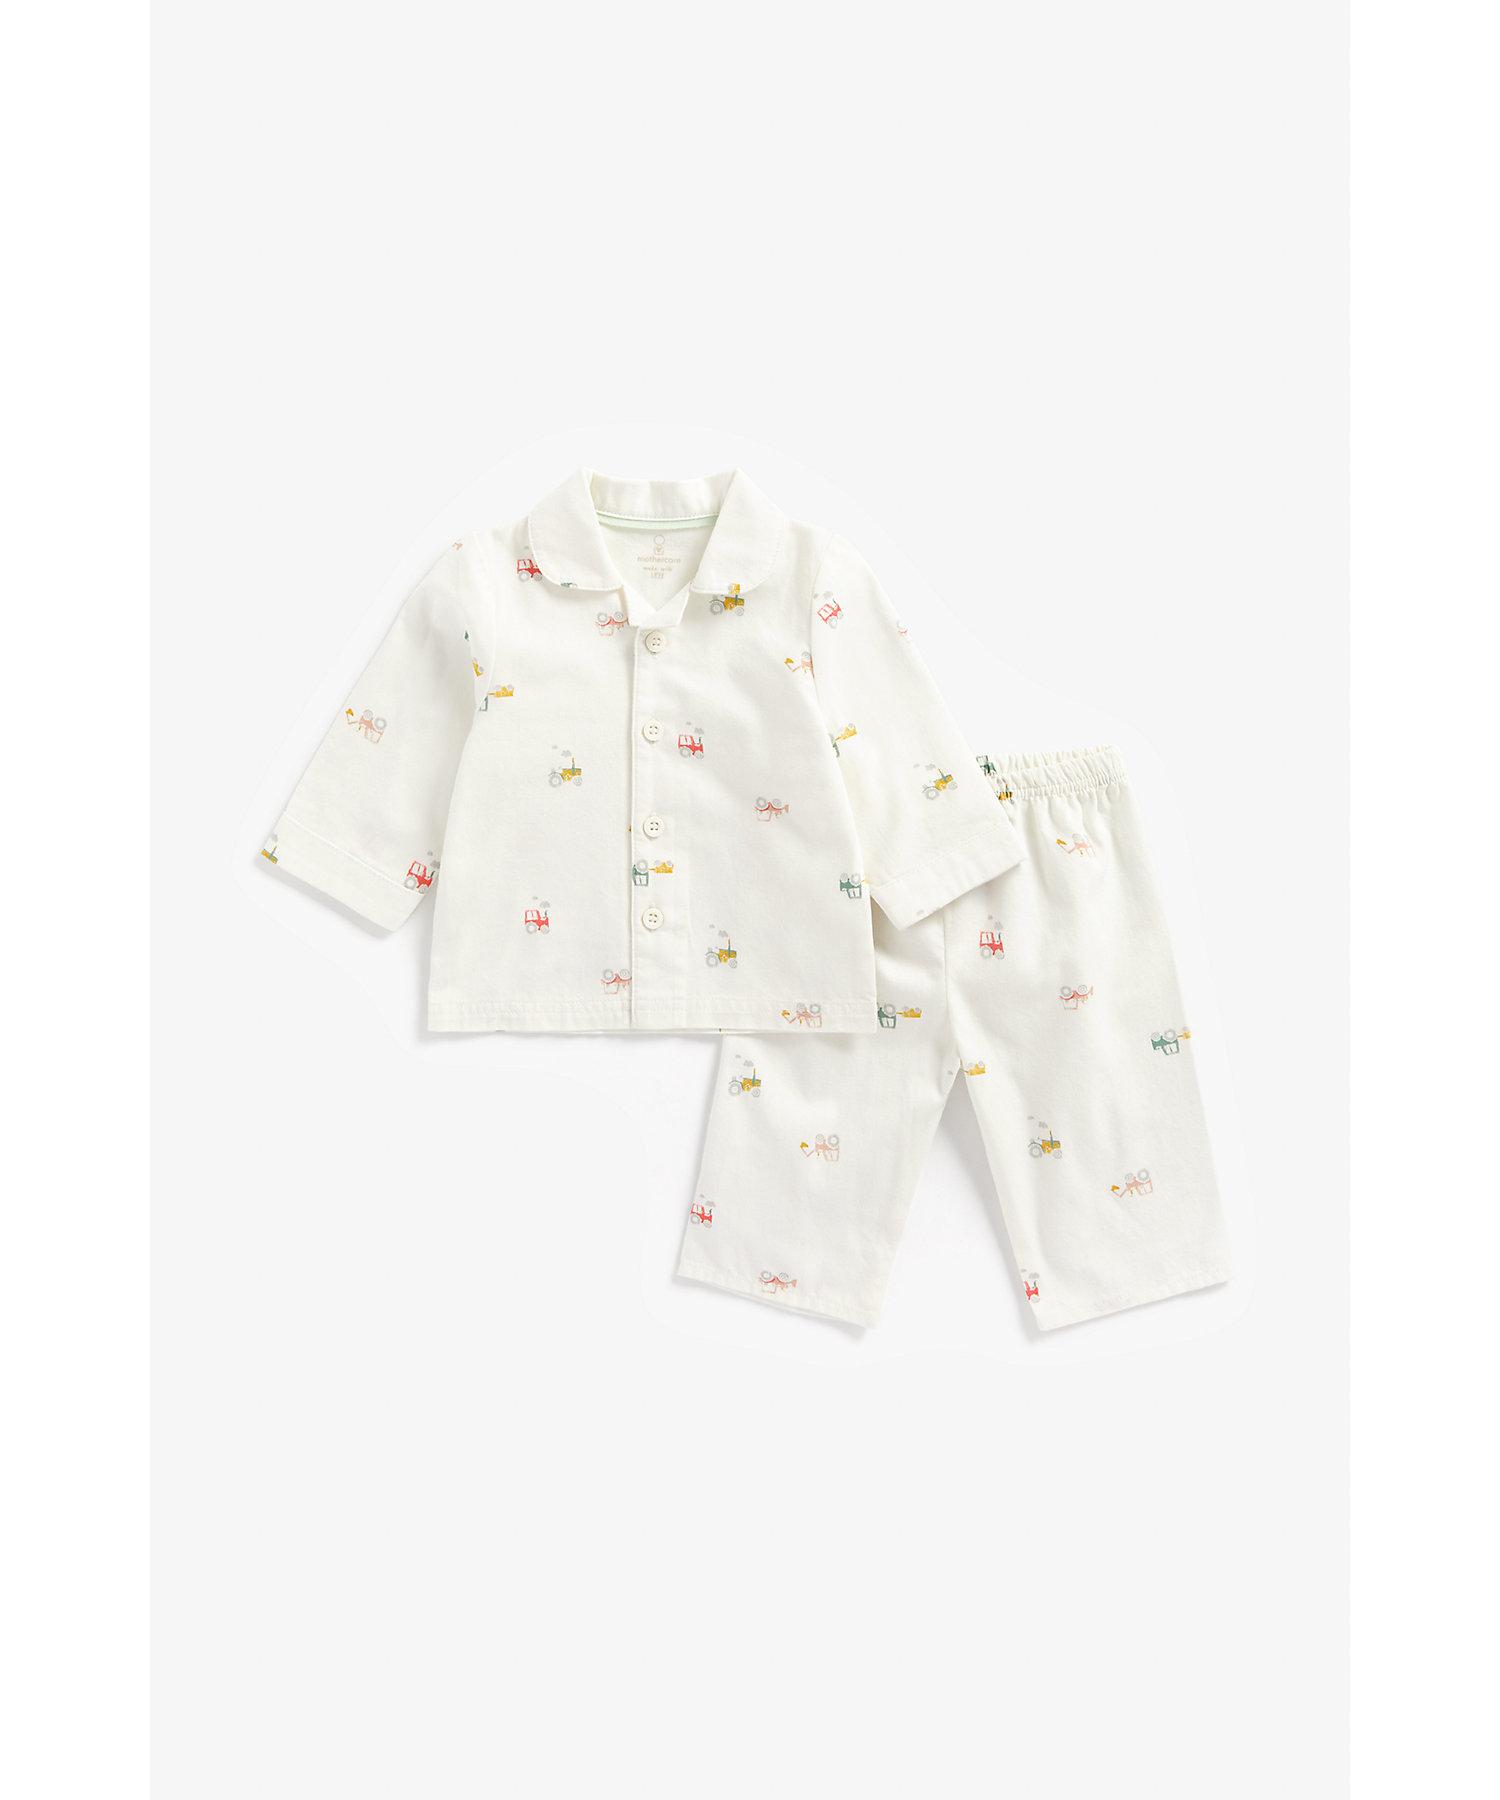 Mothercare | Boys Full Sleeves Pyjama Set Tractor Print - White